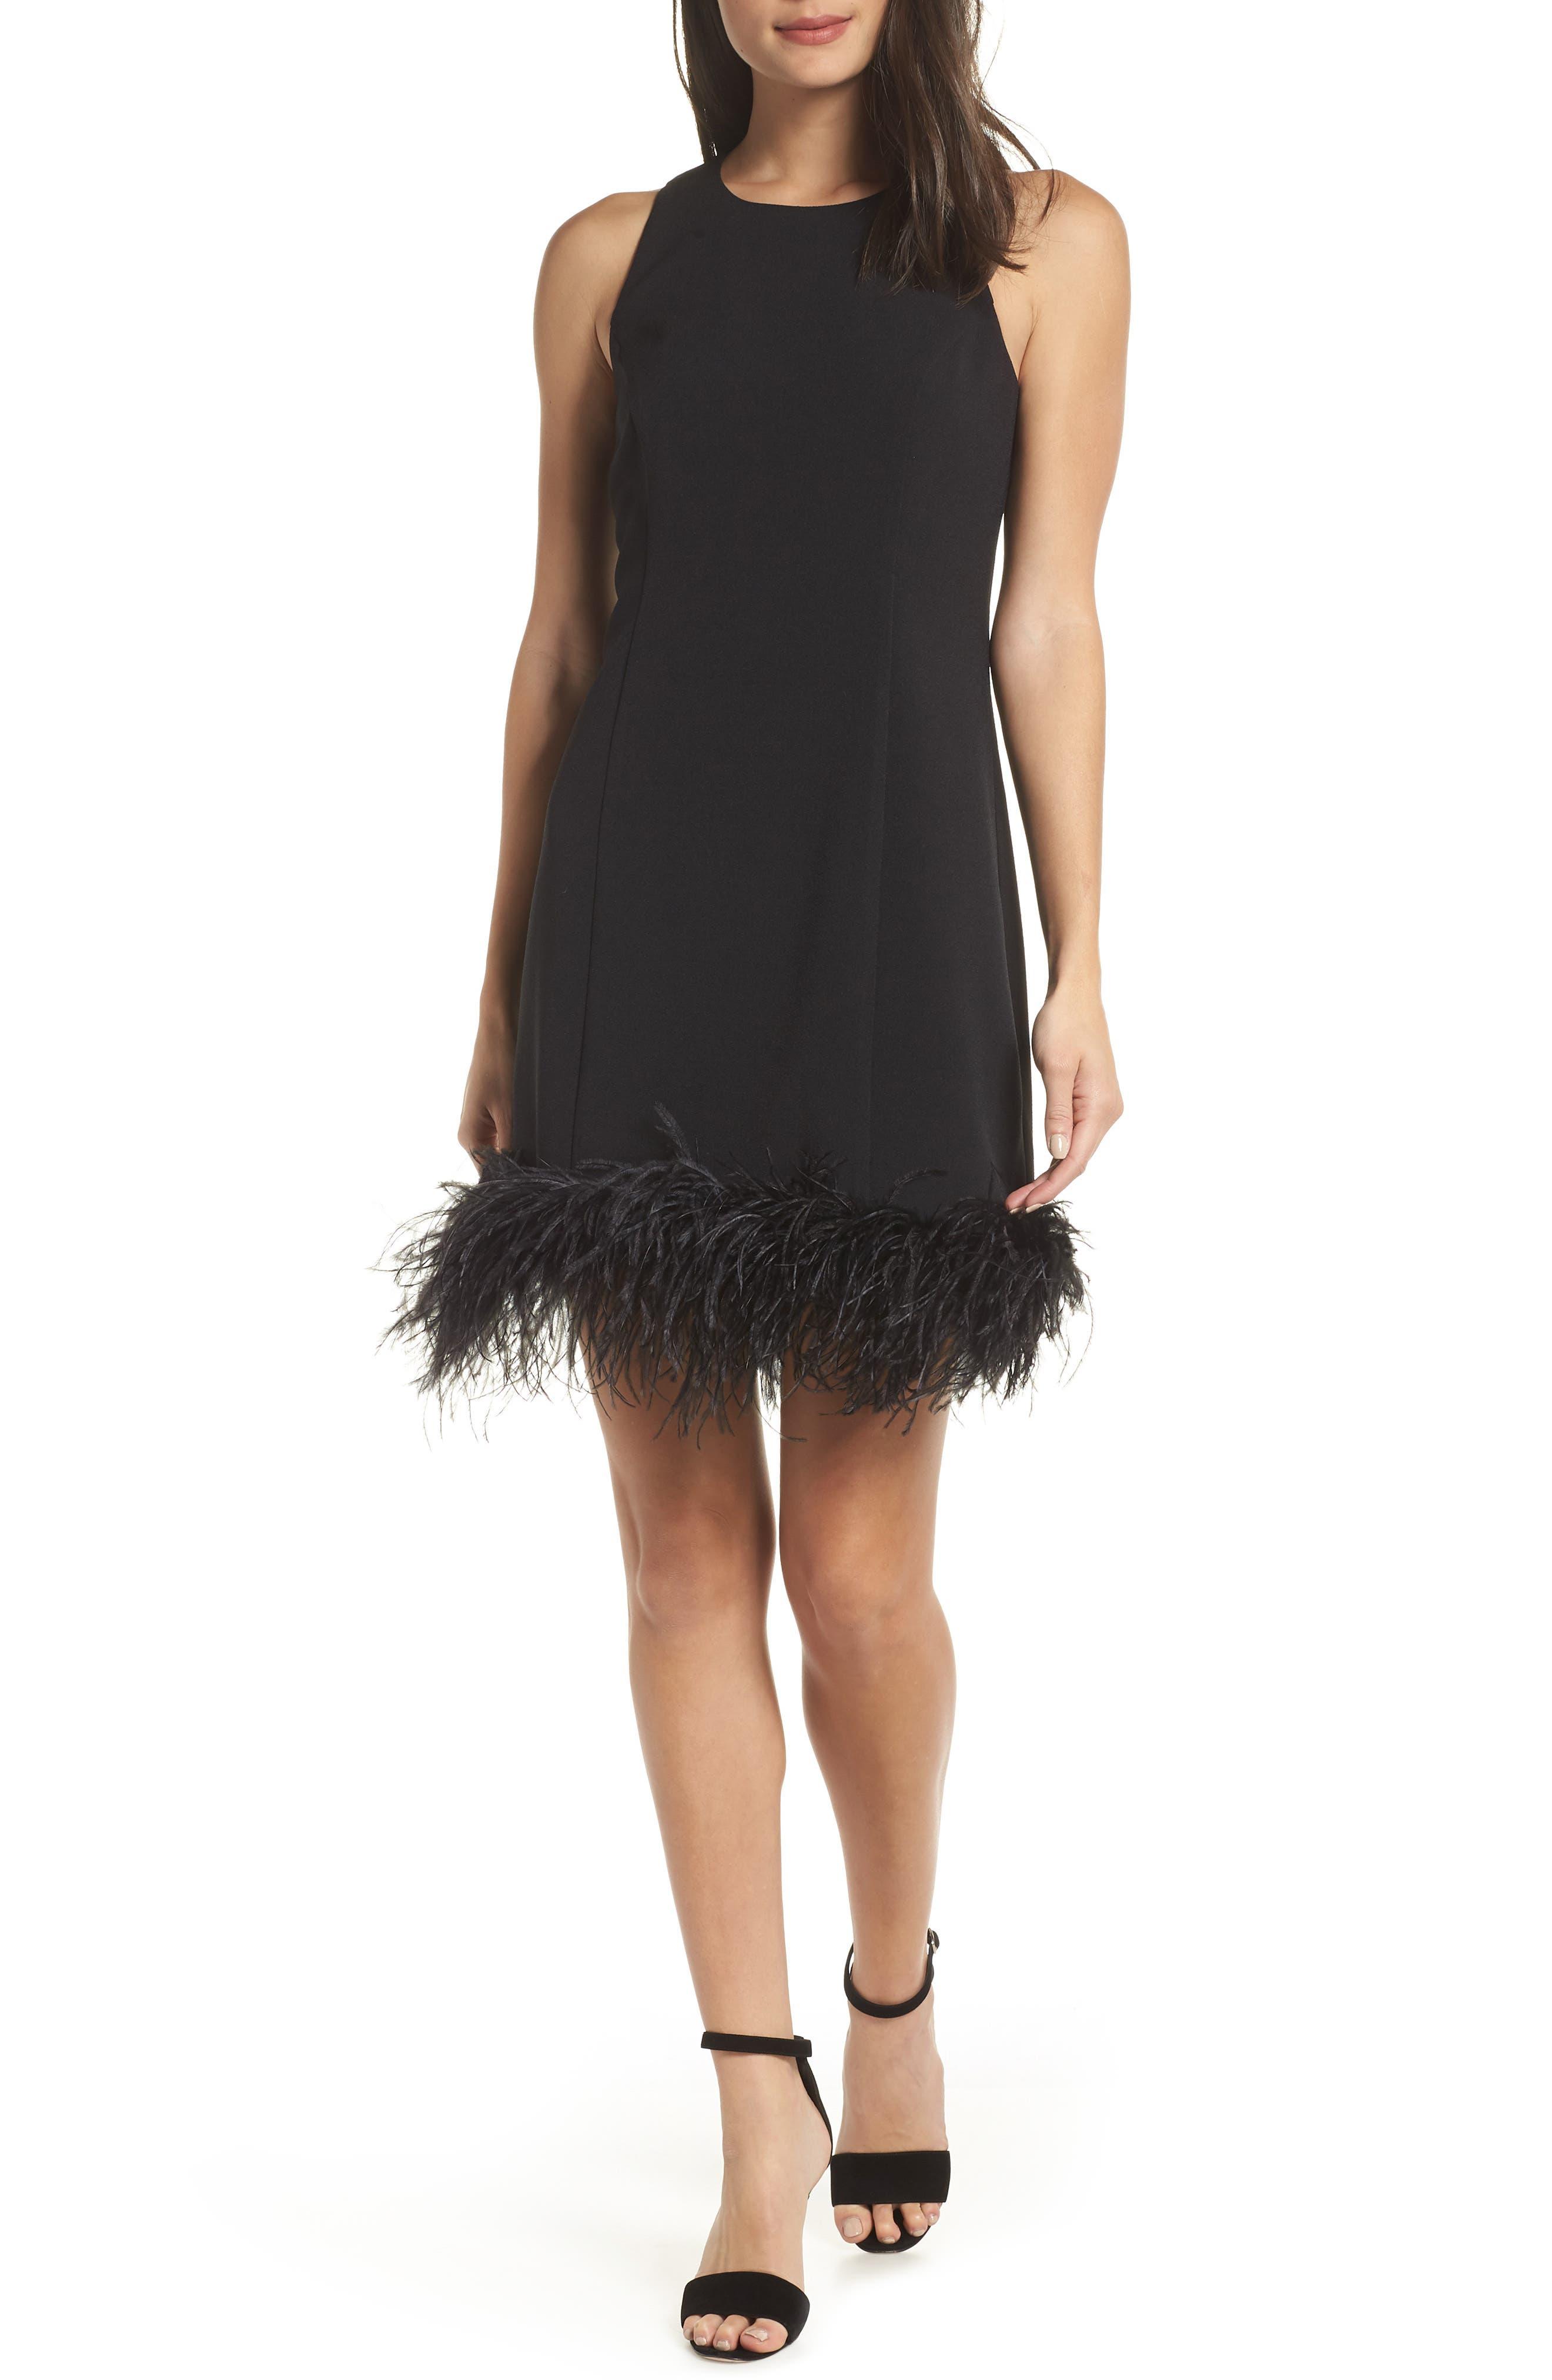 Charleston Dress: Fringe Flapper Dress Womens Chelsea28 Feather Hem Sheath Dress Size 6 - Black $159.00 AT vintagedancer.com